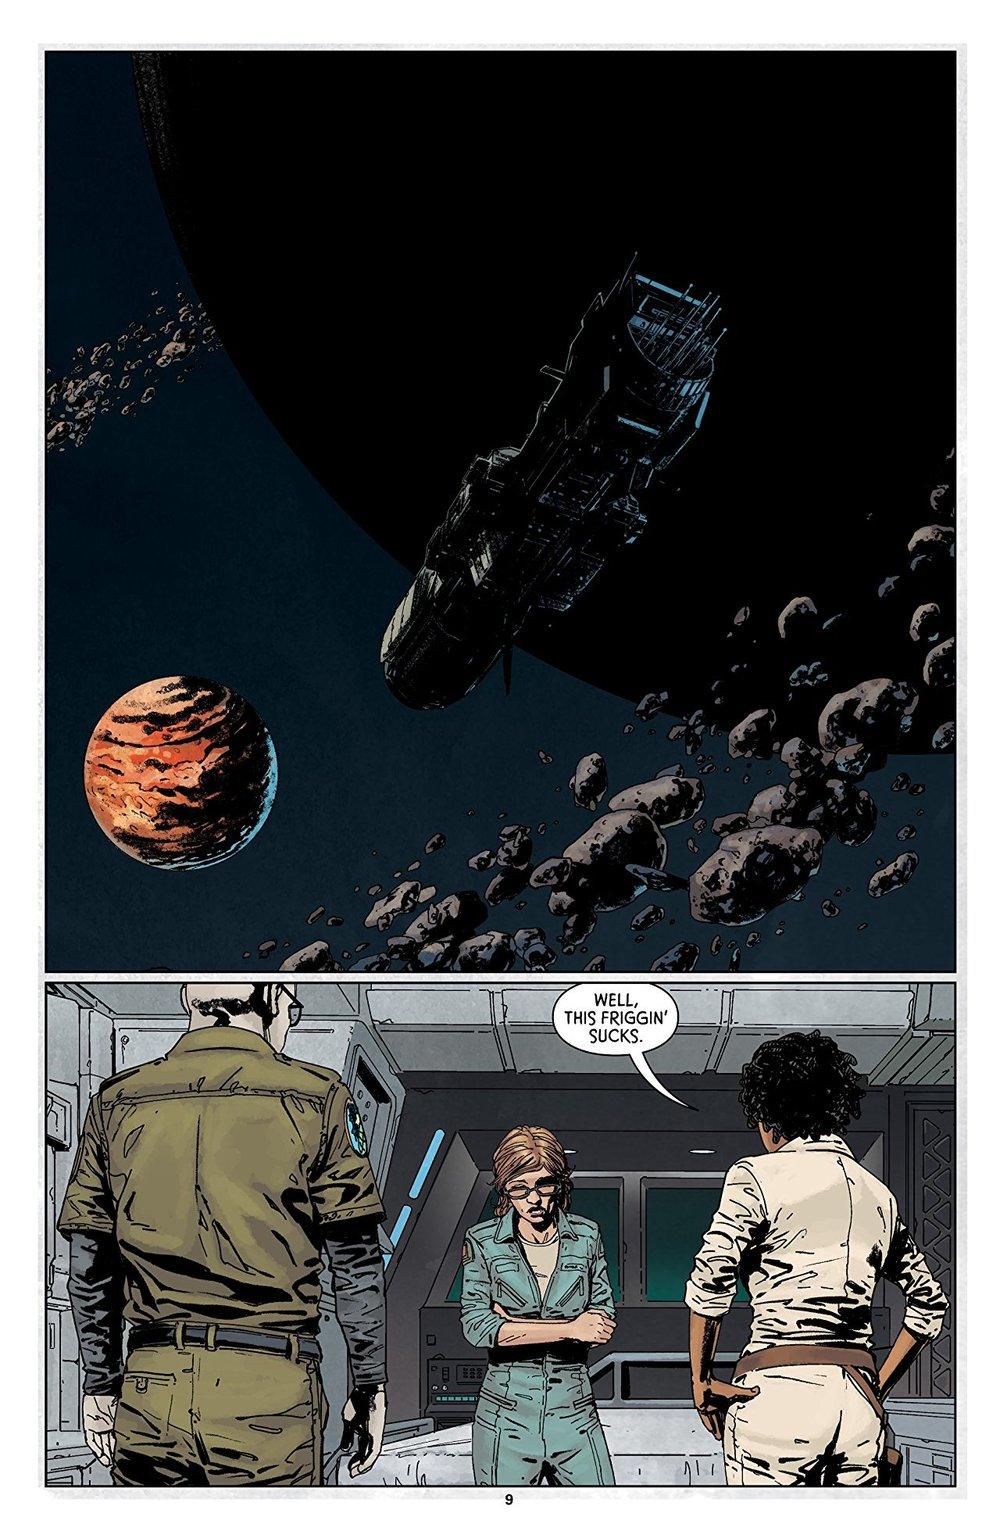 (Art by Stephen Thompson/Dark Horse Comics. Source:  Comixology )